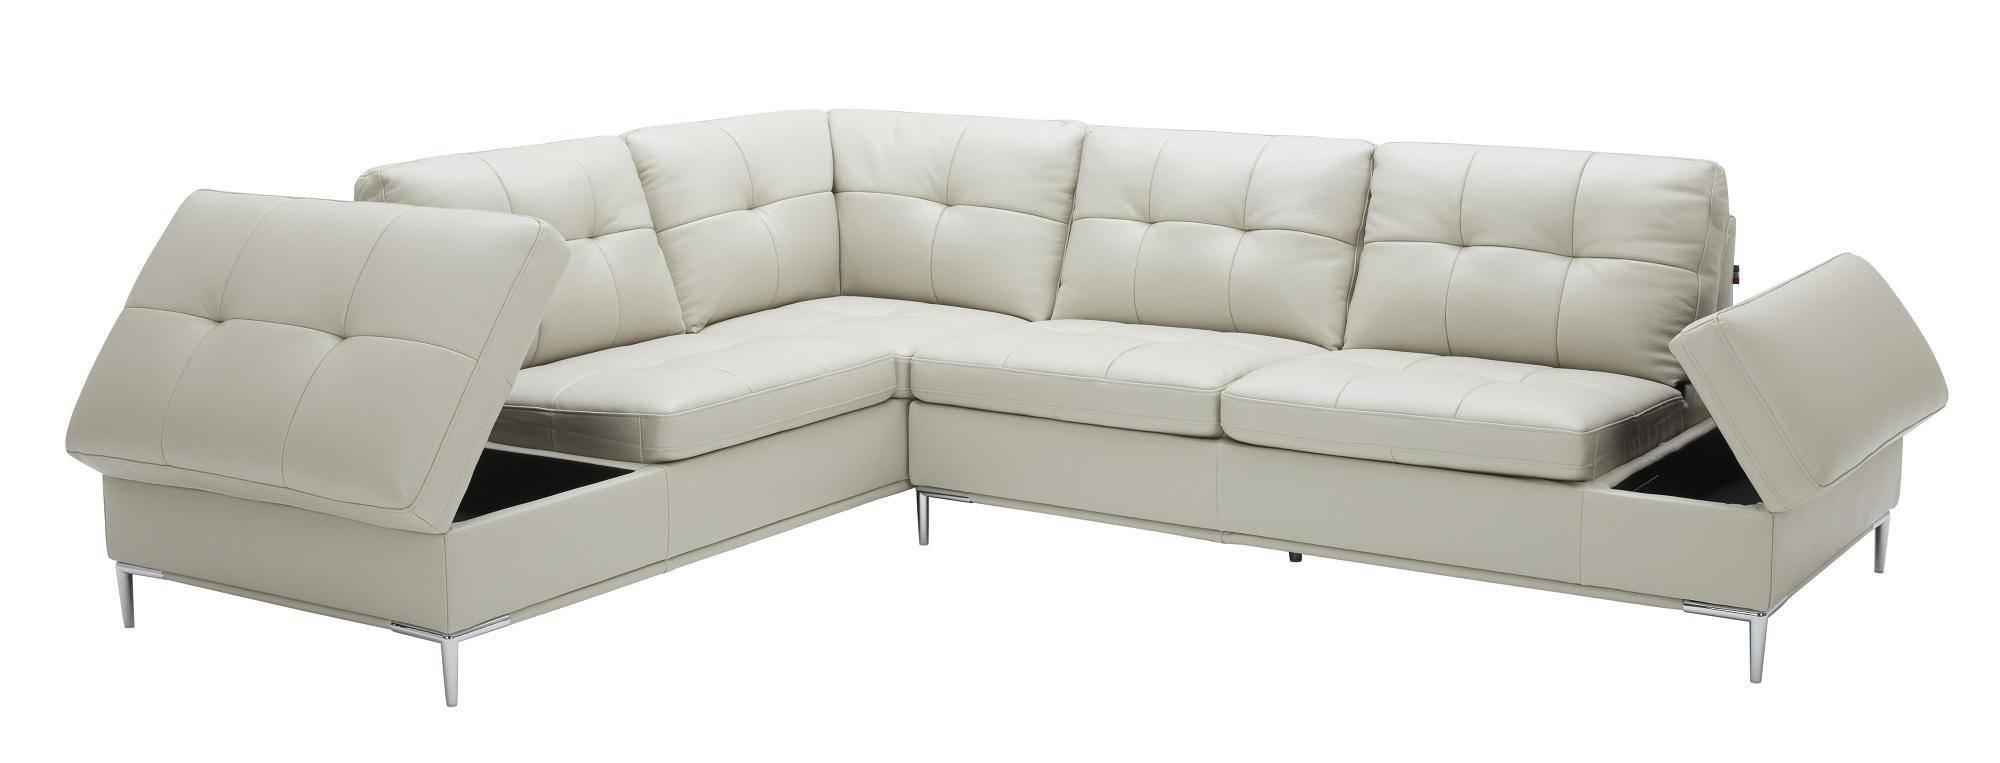 Buy J&M Leonardo Sectional Sofa Left Hand Chase in Silver ...